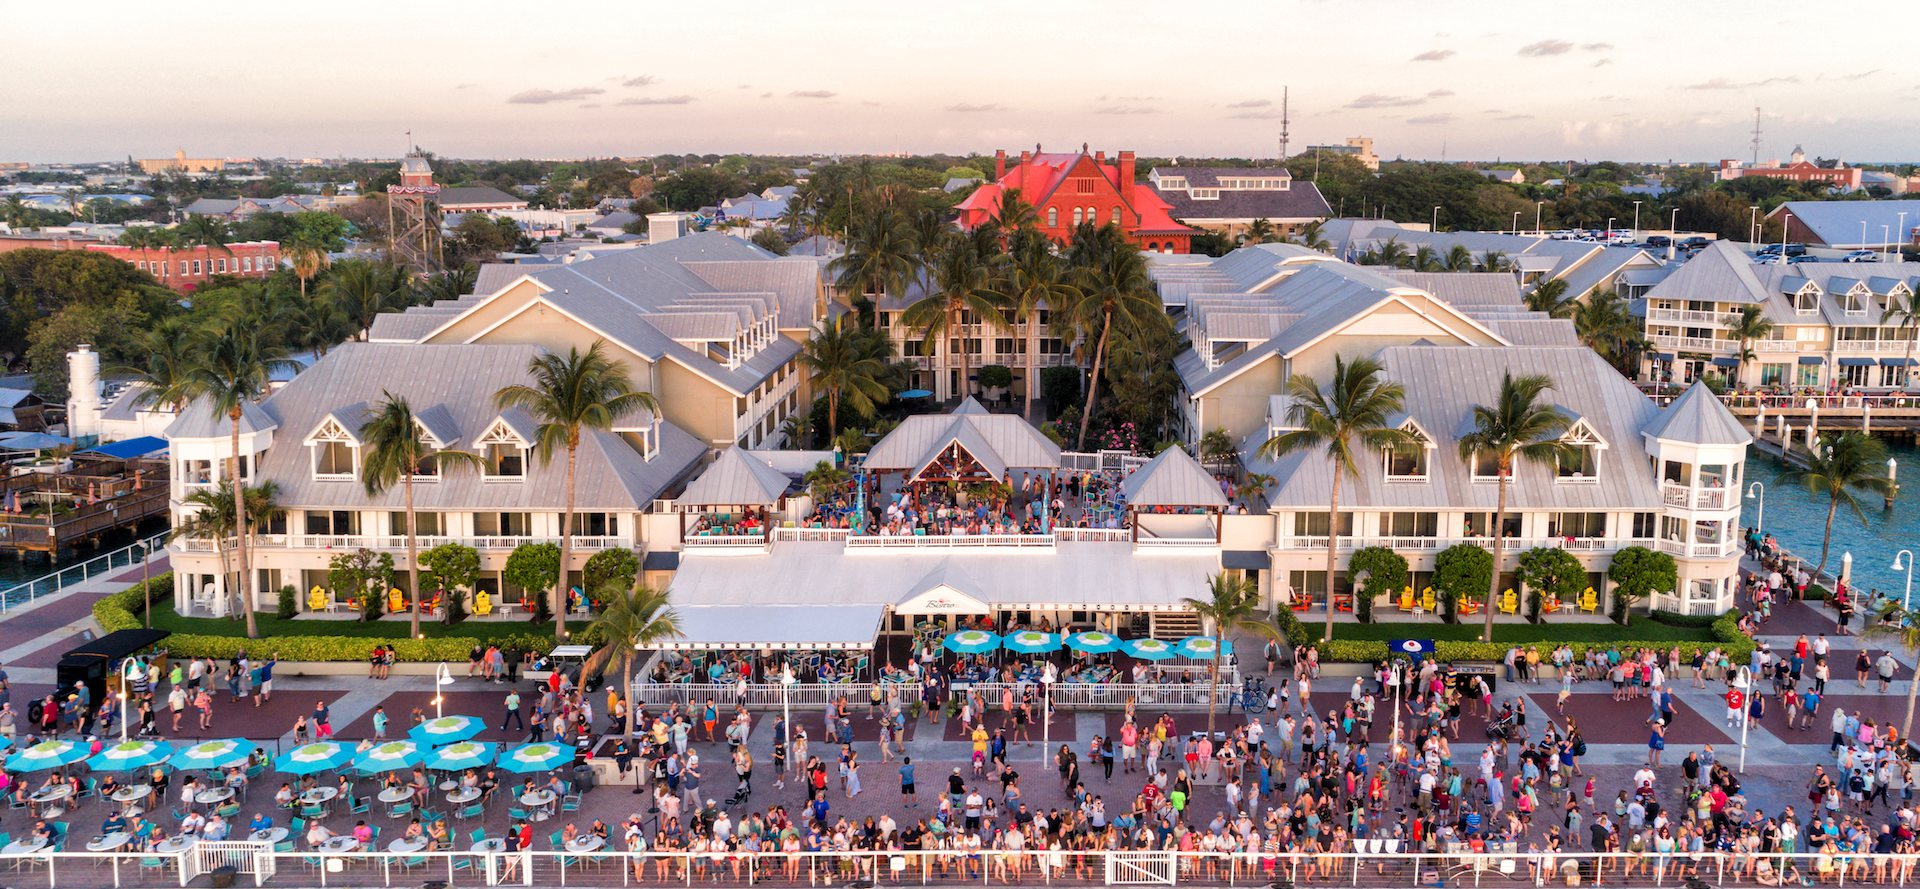 Key West Dining Options at Margaritaville Resort & Marina